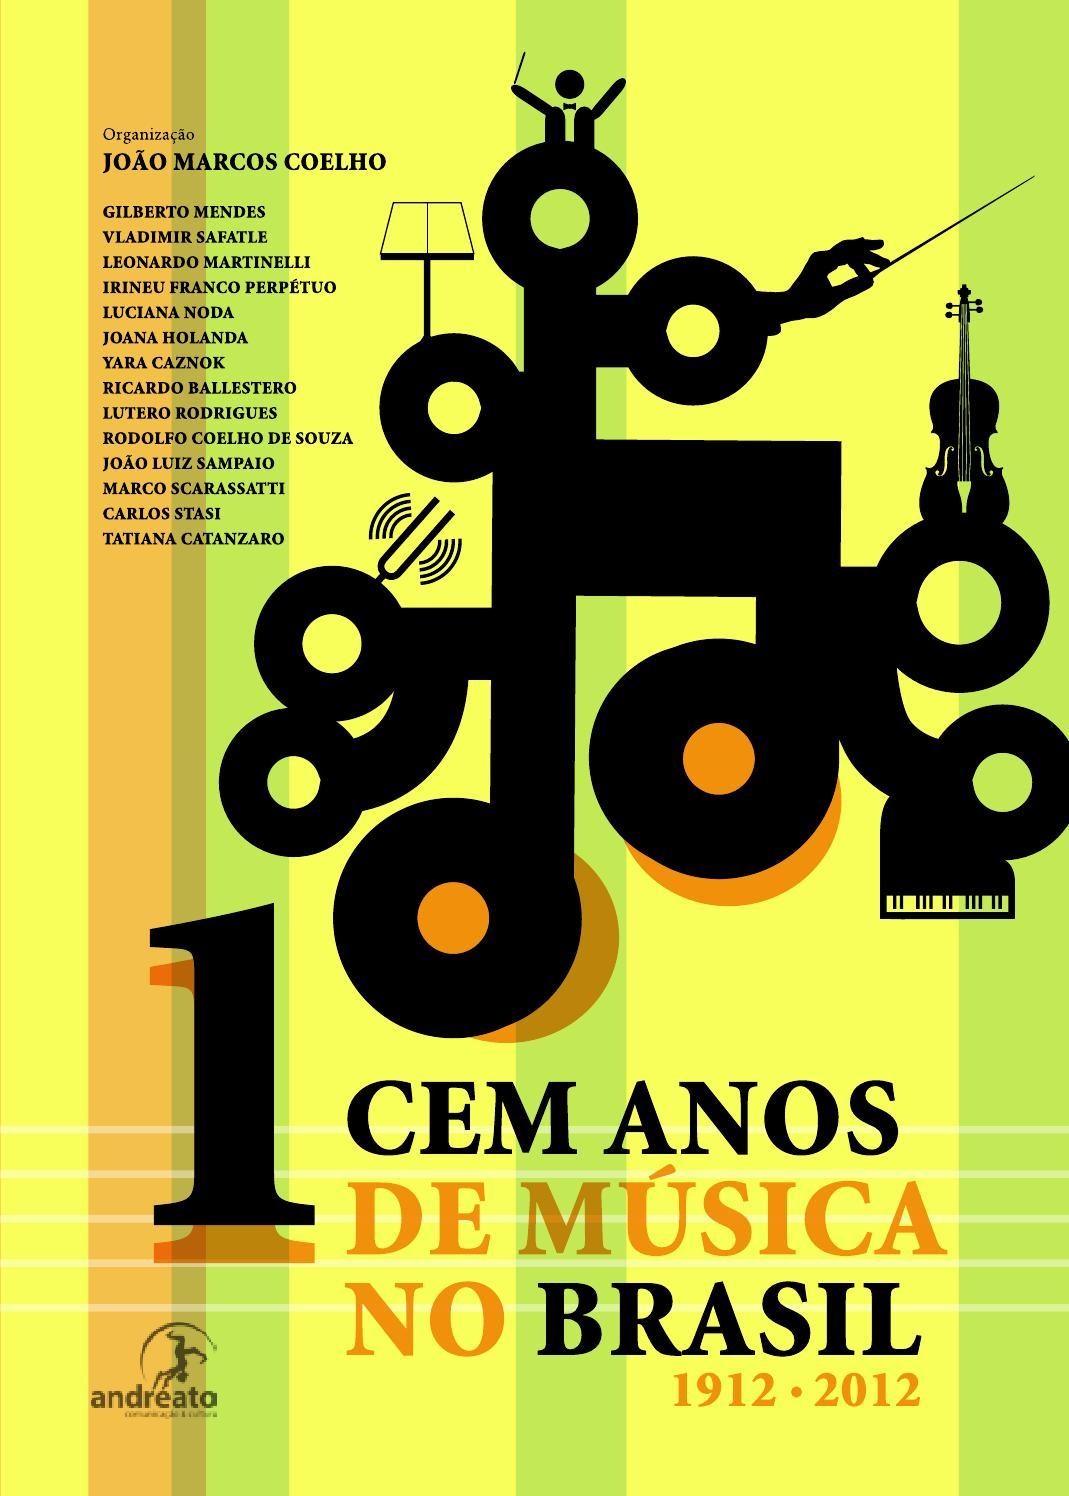 d84ce2465c Cem anos de música no Brasil 1912-2012 by instituto cpfl - issuu